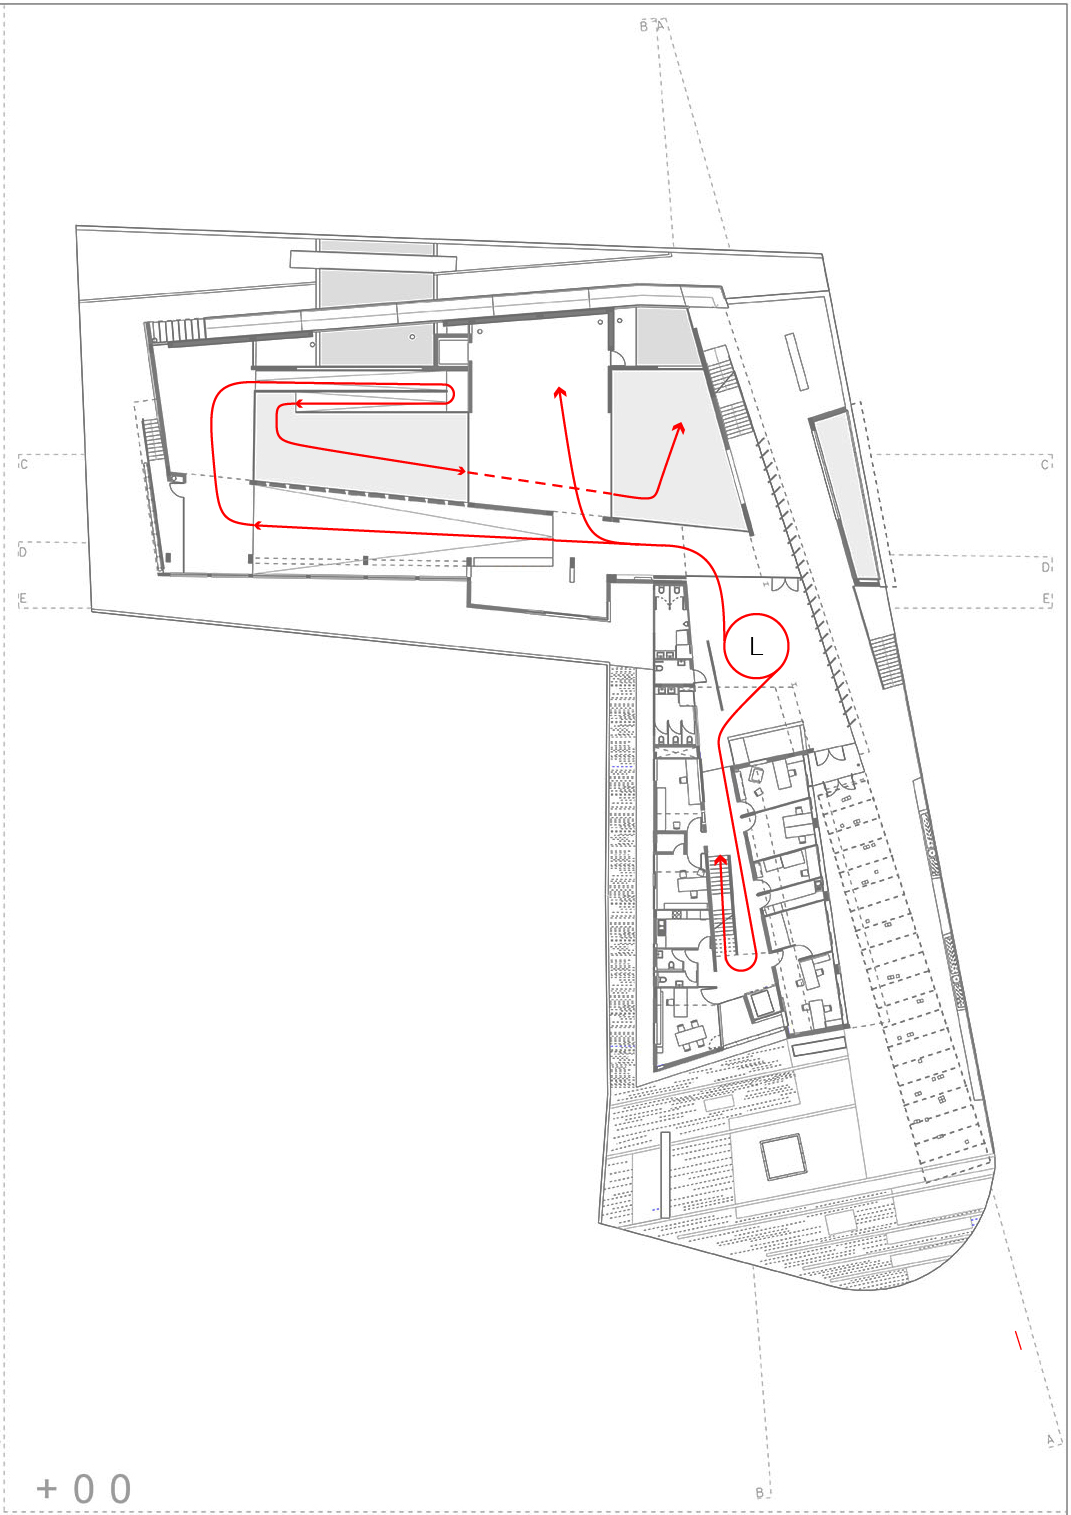 Interior circulation - flow between programmes